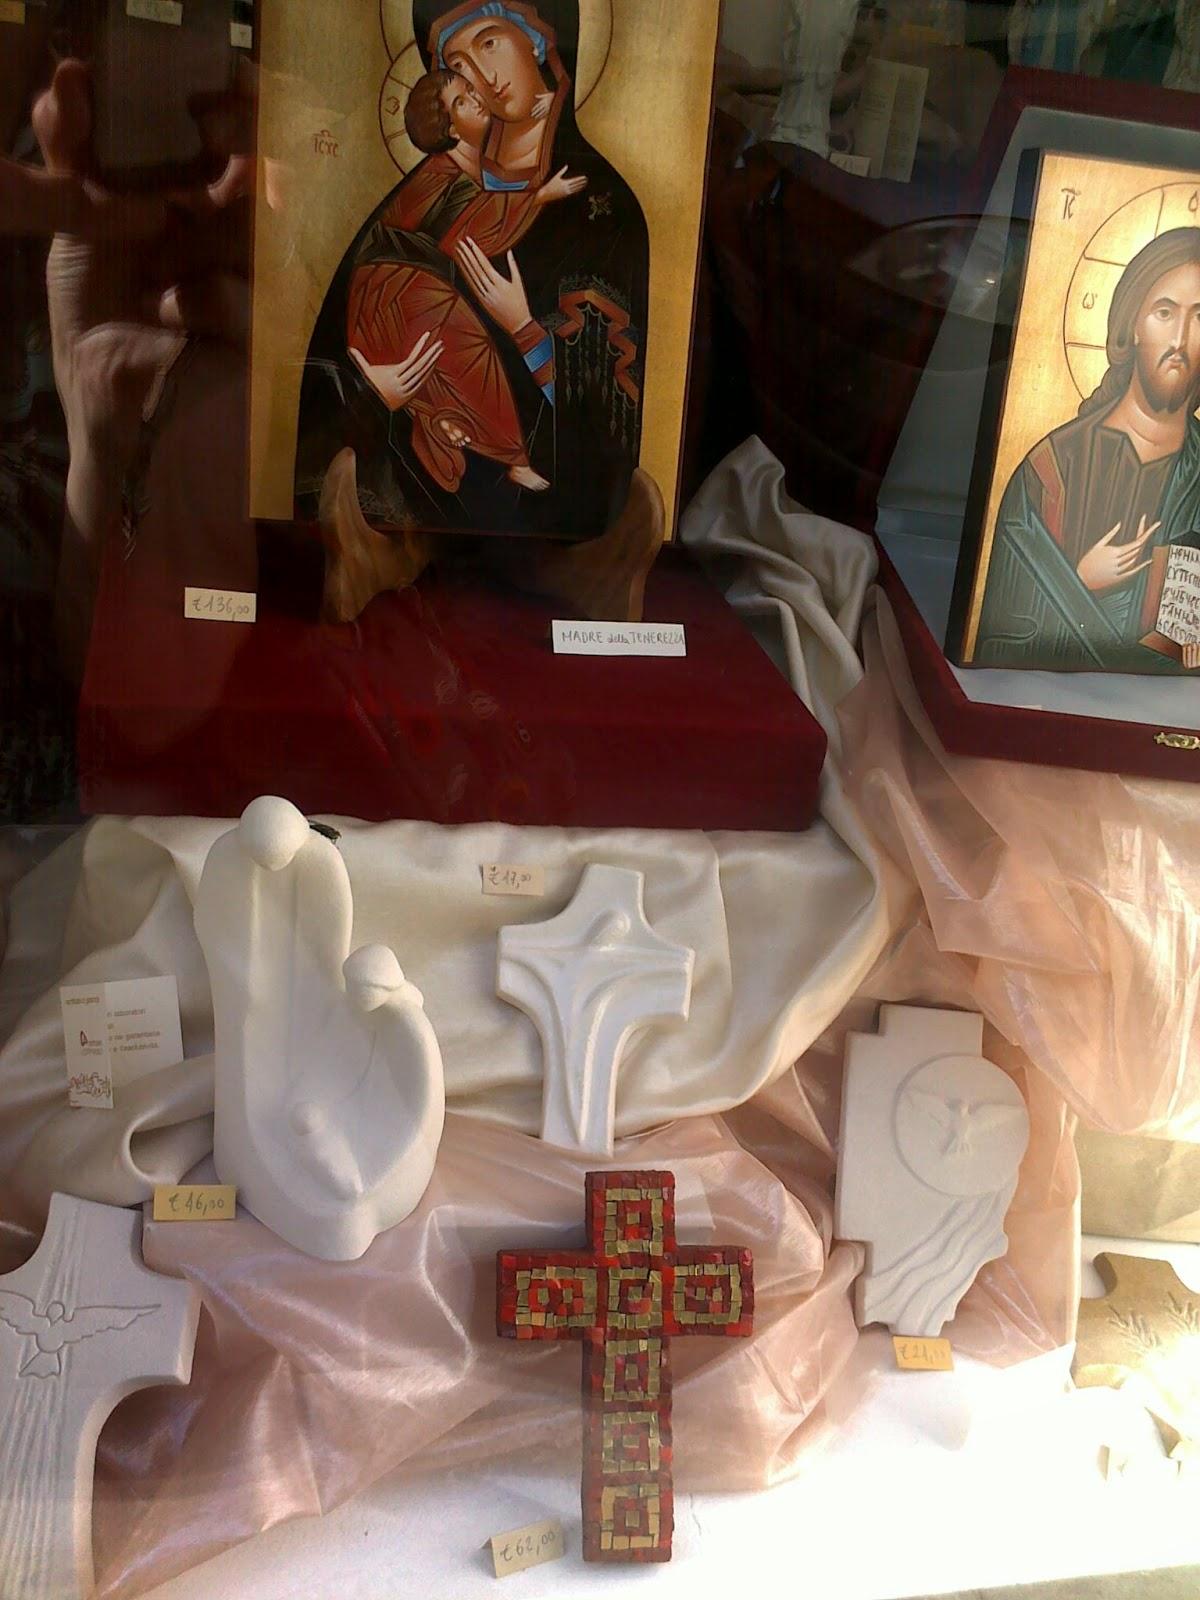 In arte hashimoto nuove croci in vendita da arte sacra - Pagine da colorare croci ...